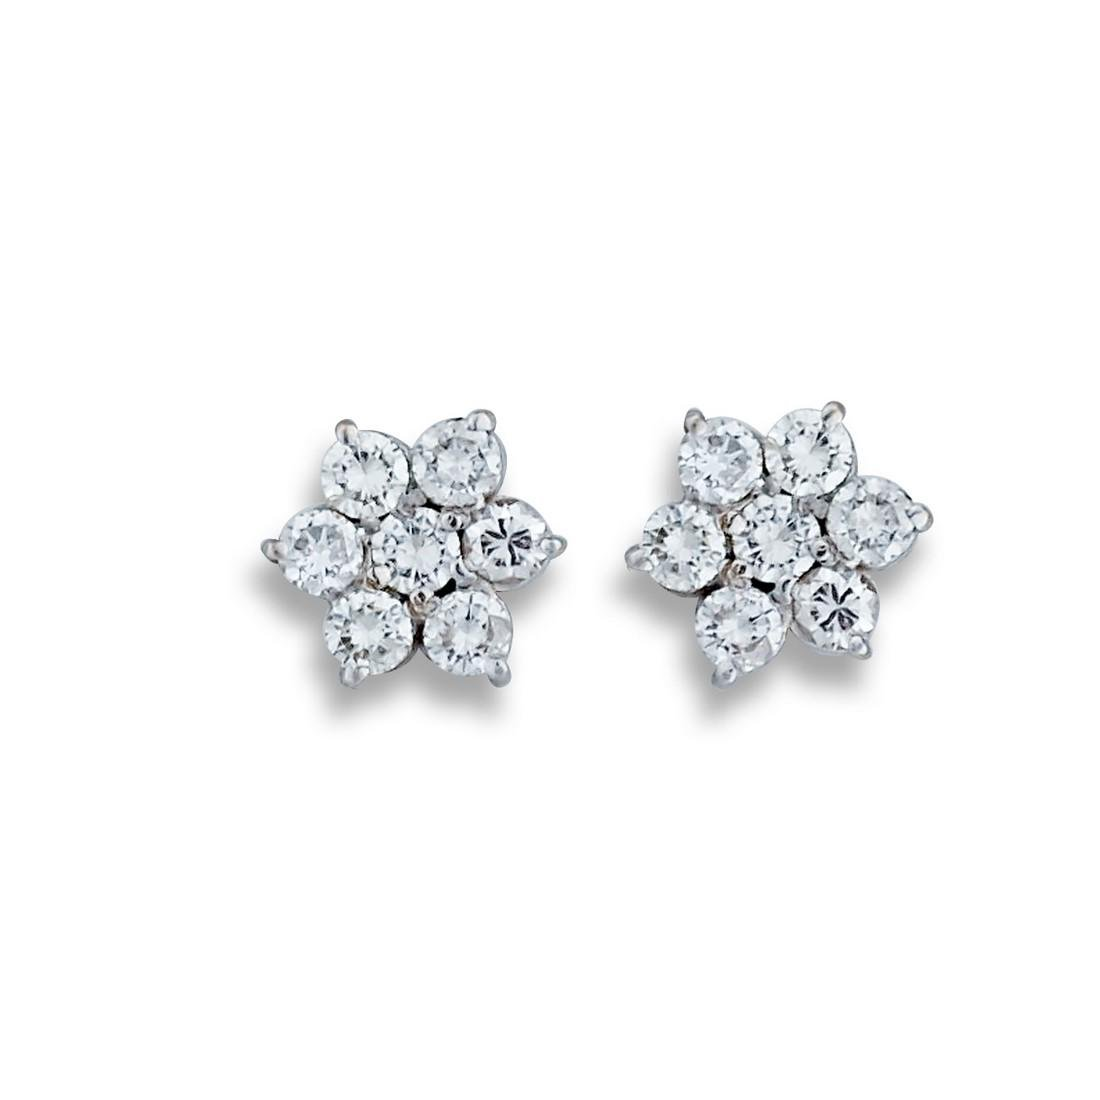 Sparkling, Diamond 1.30 TCW, Cluster Earrings, 14 Karat